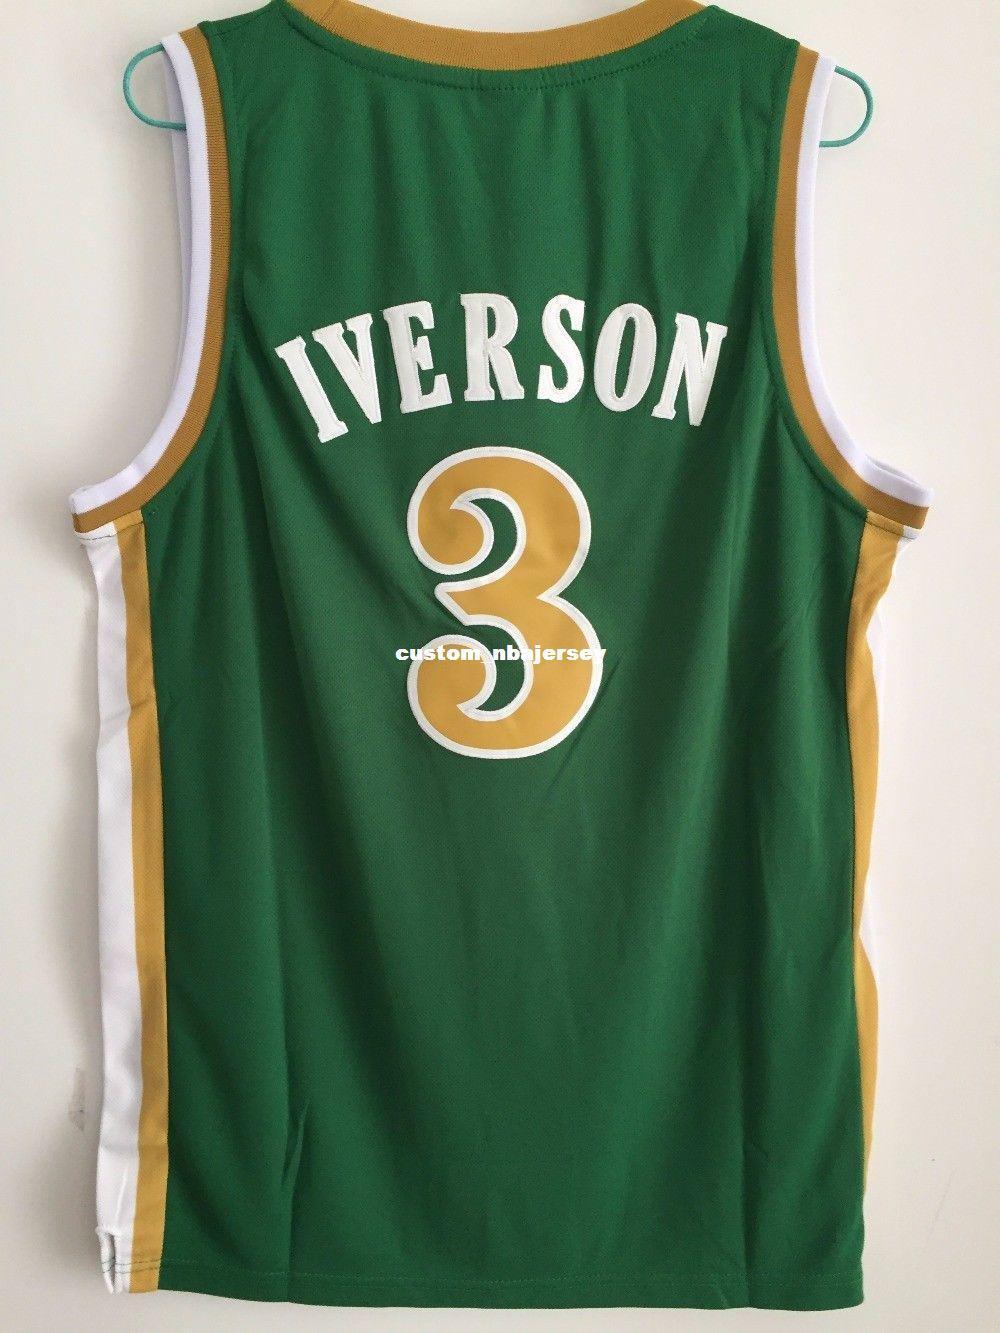 Cheap Custom  3 Allen Bethel High School Basketball Jersey XS 5XL Green  Stitch Customize Any Number Name MEN WOMEN YOUTH XS 5XL UK 2019 From ... 3b3c2a644